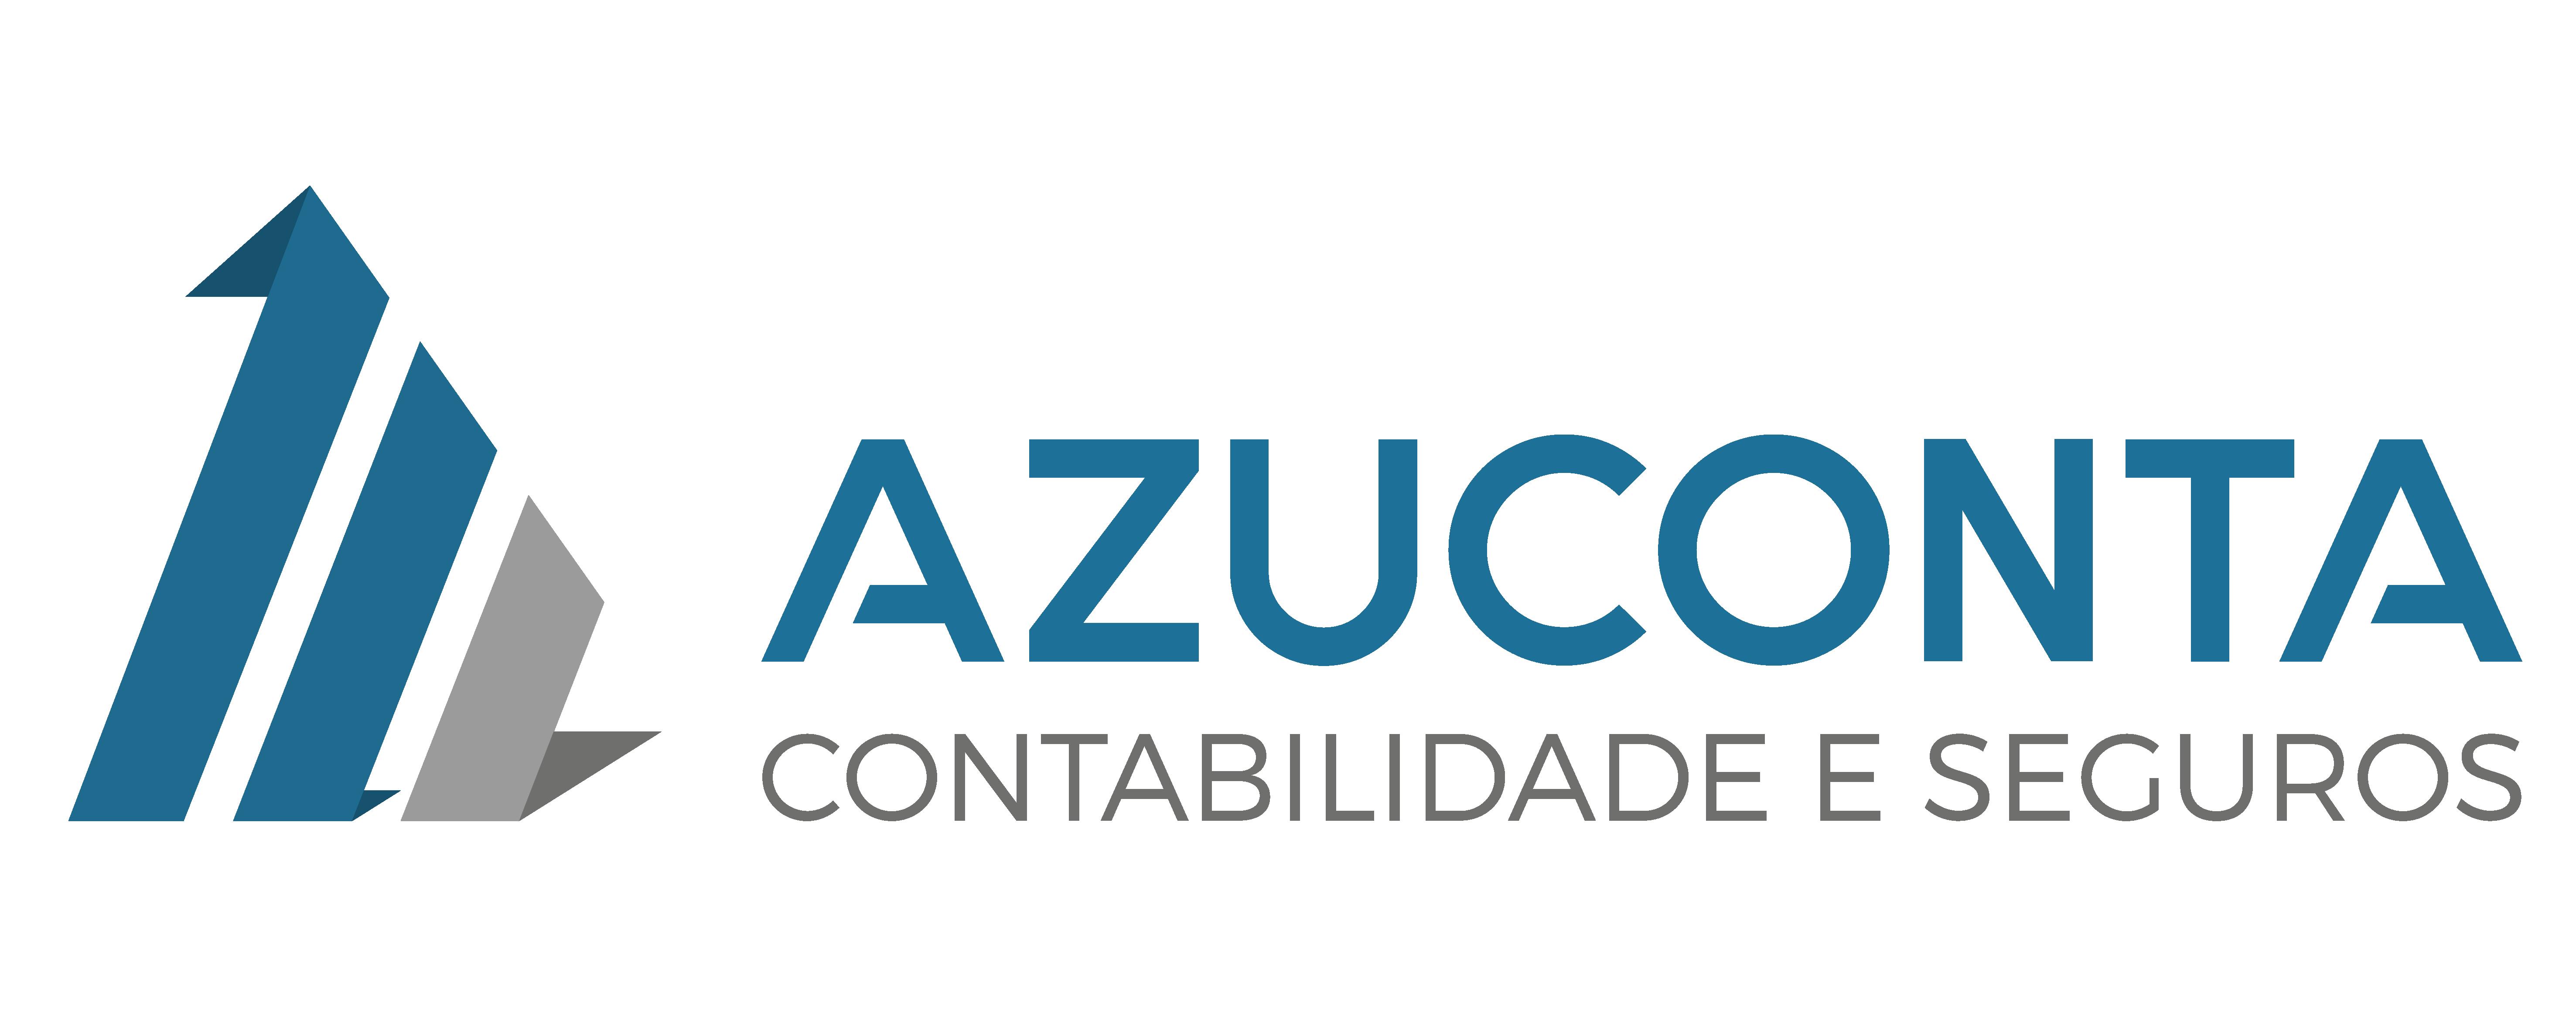 Azuconta